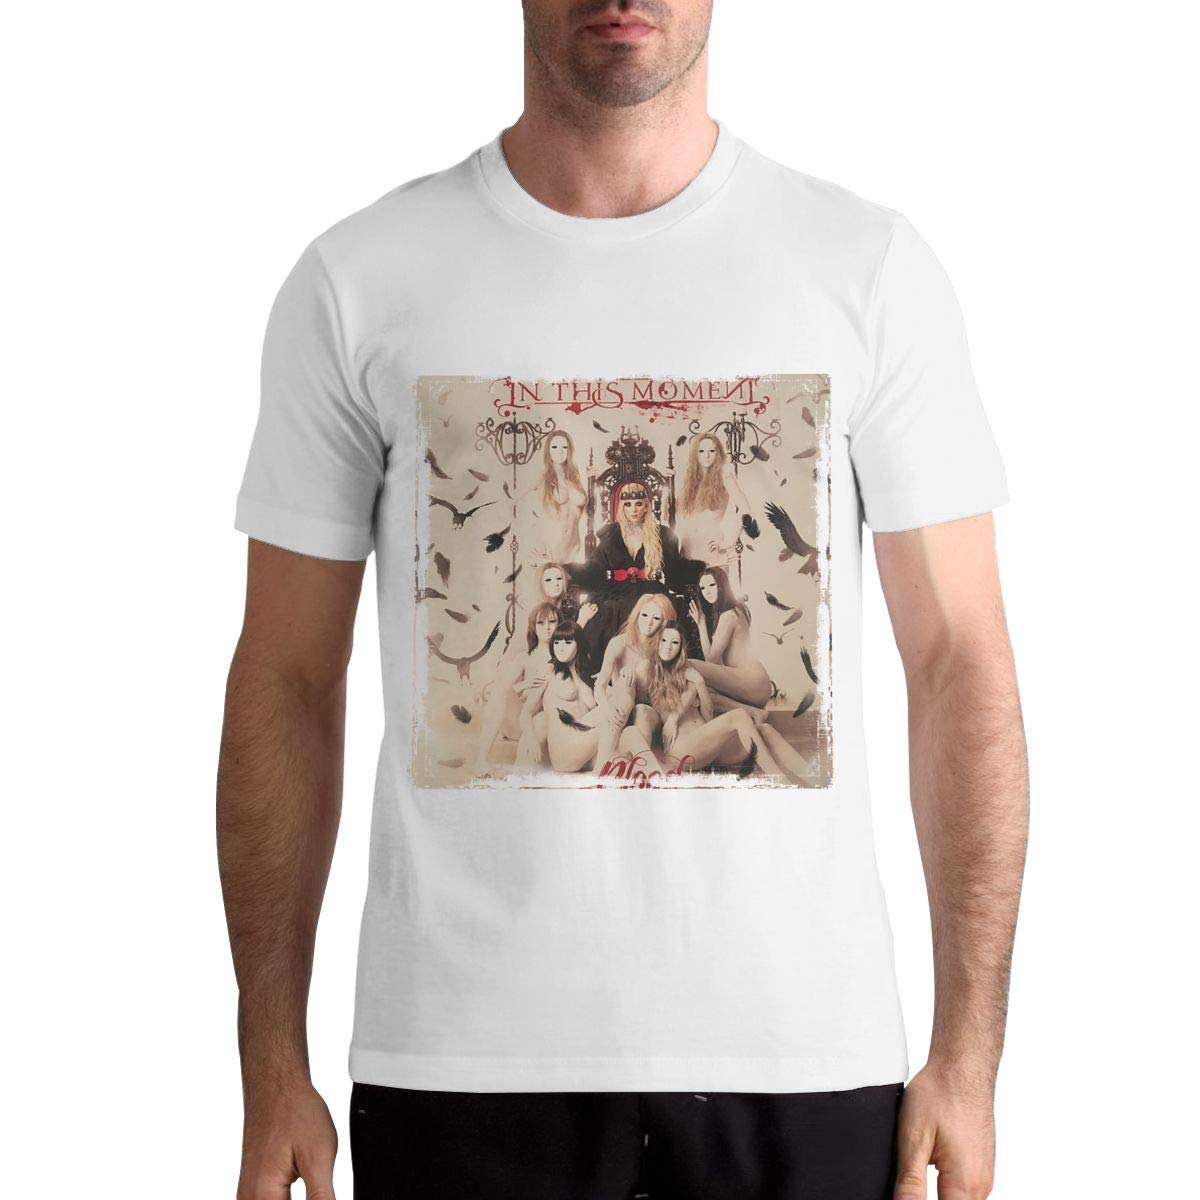 Ryancschmitt Maria Brink Fashion For Man Custom Short Sleeve Top S Shirts